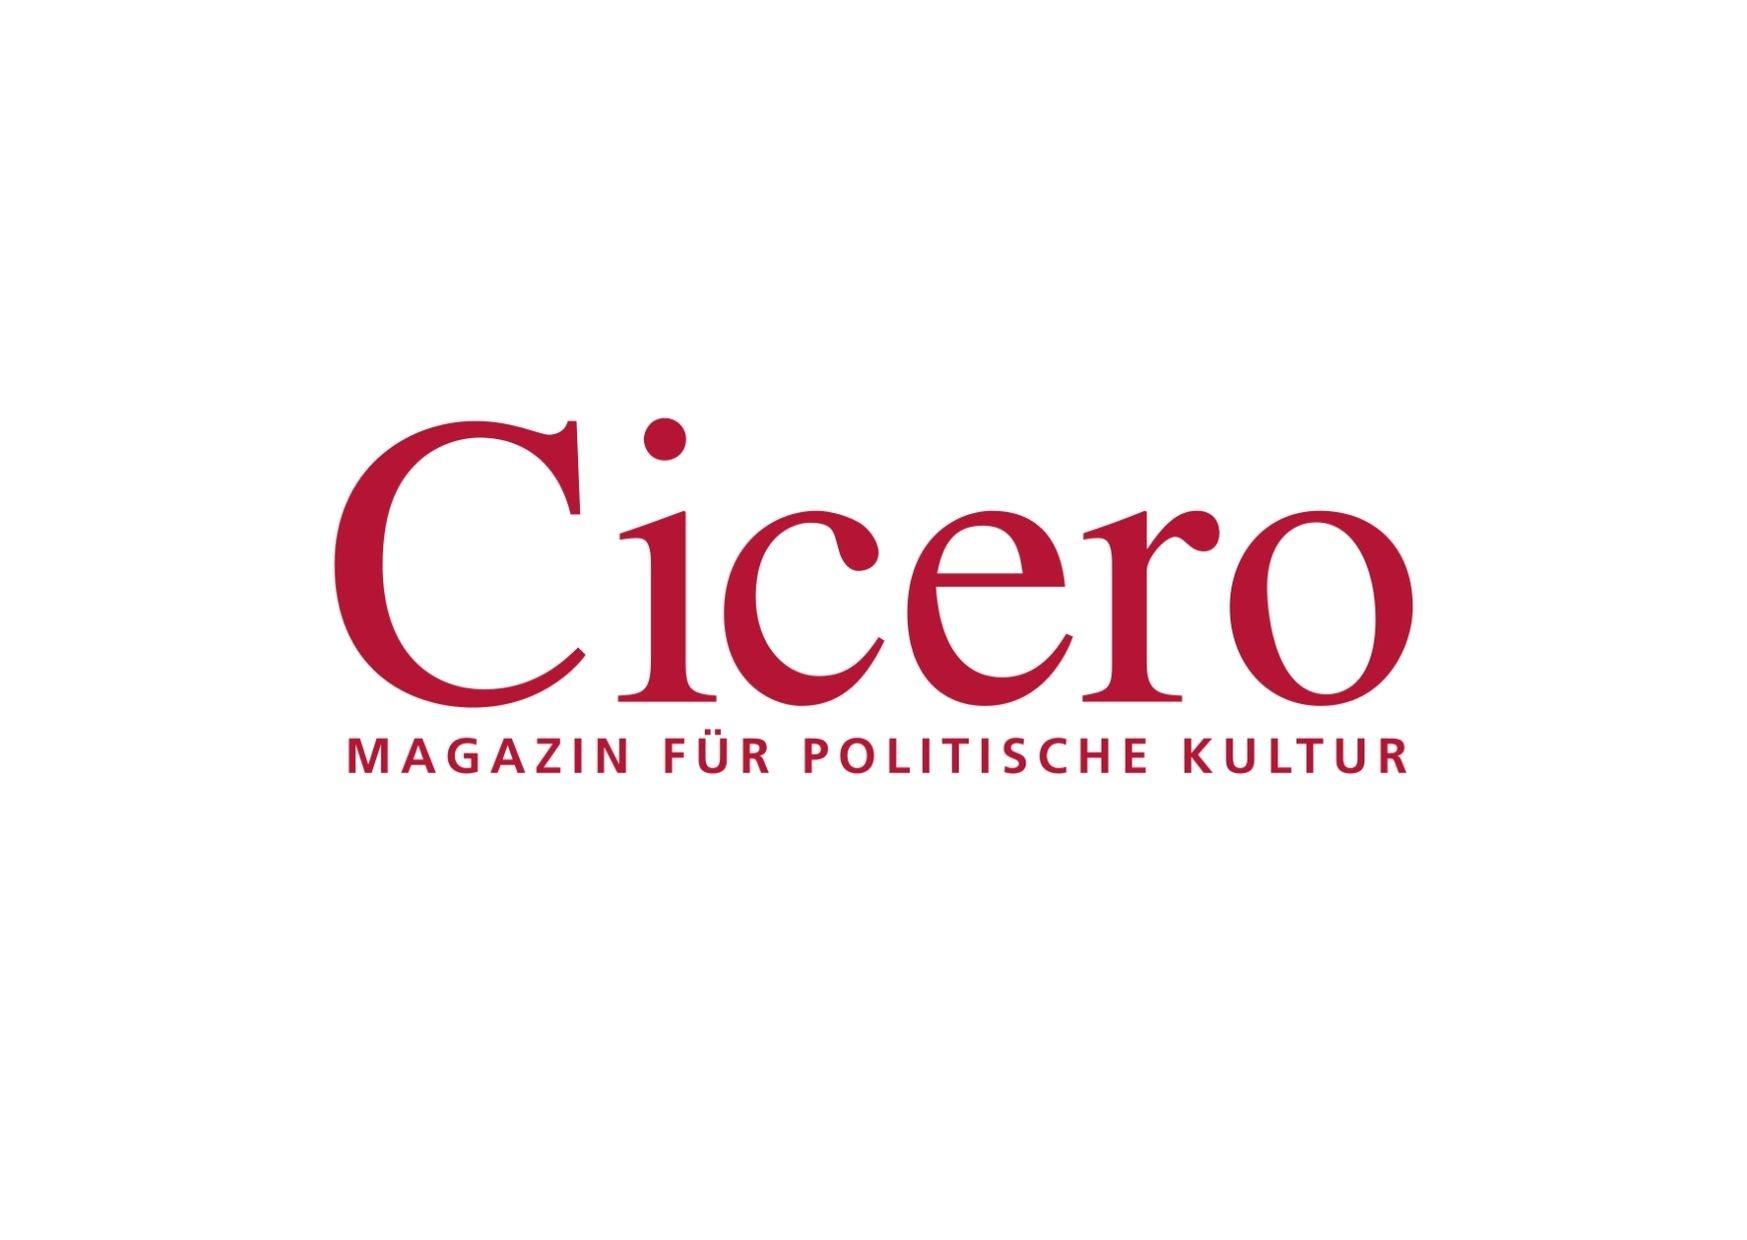 Noreena's Interview in Germany's Cicero Magazine